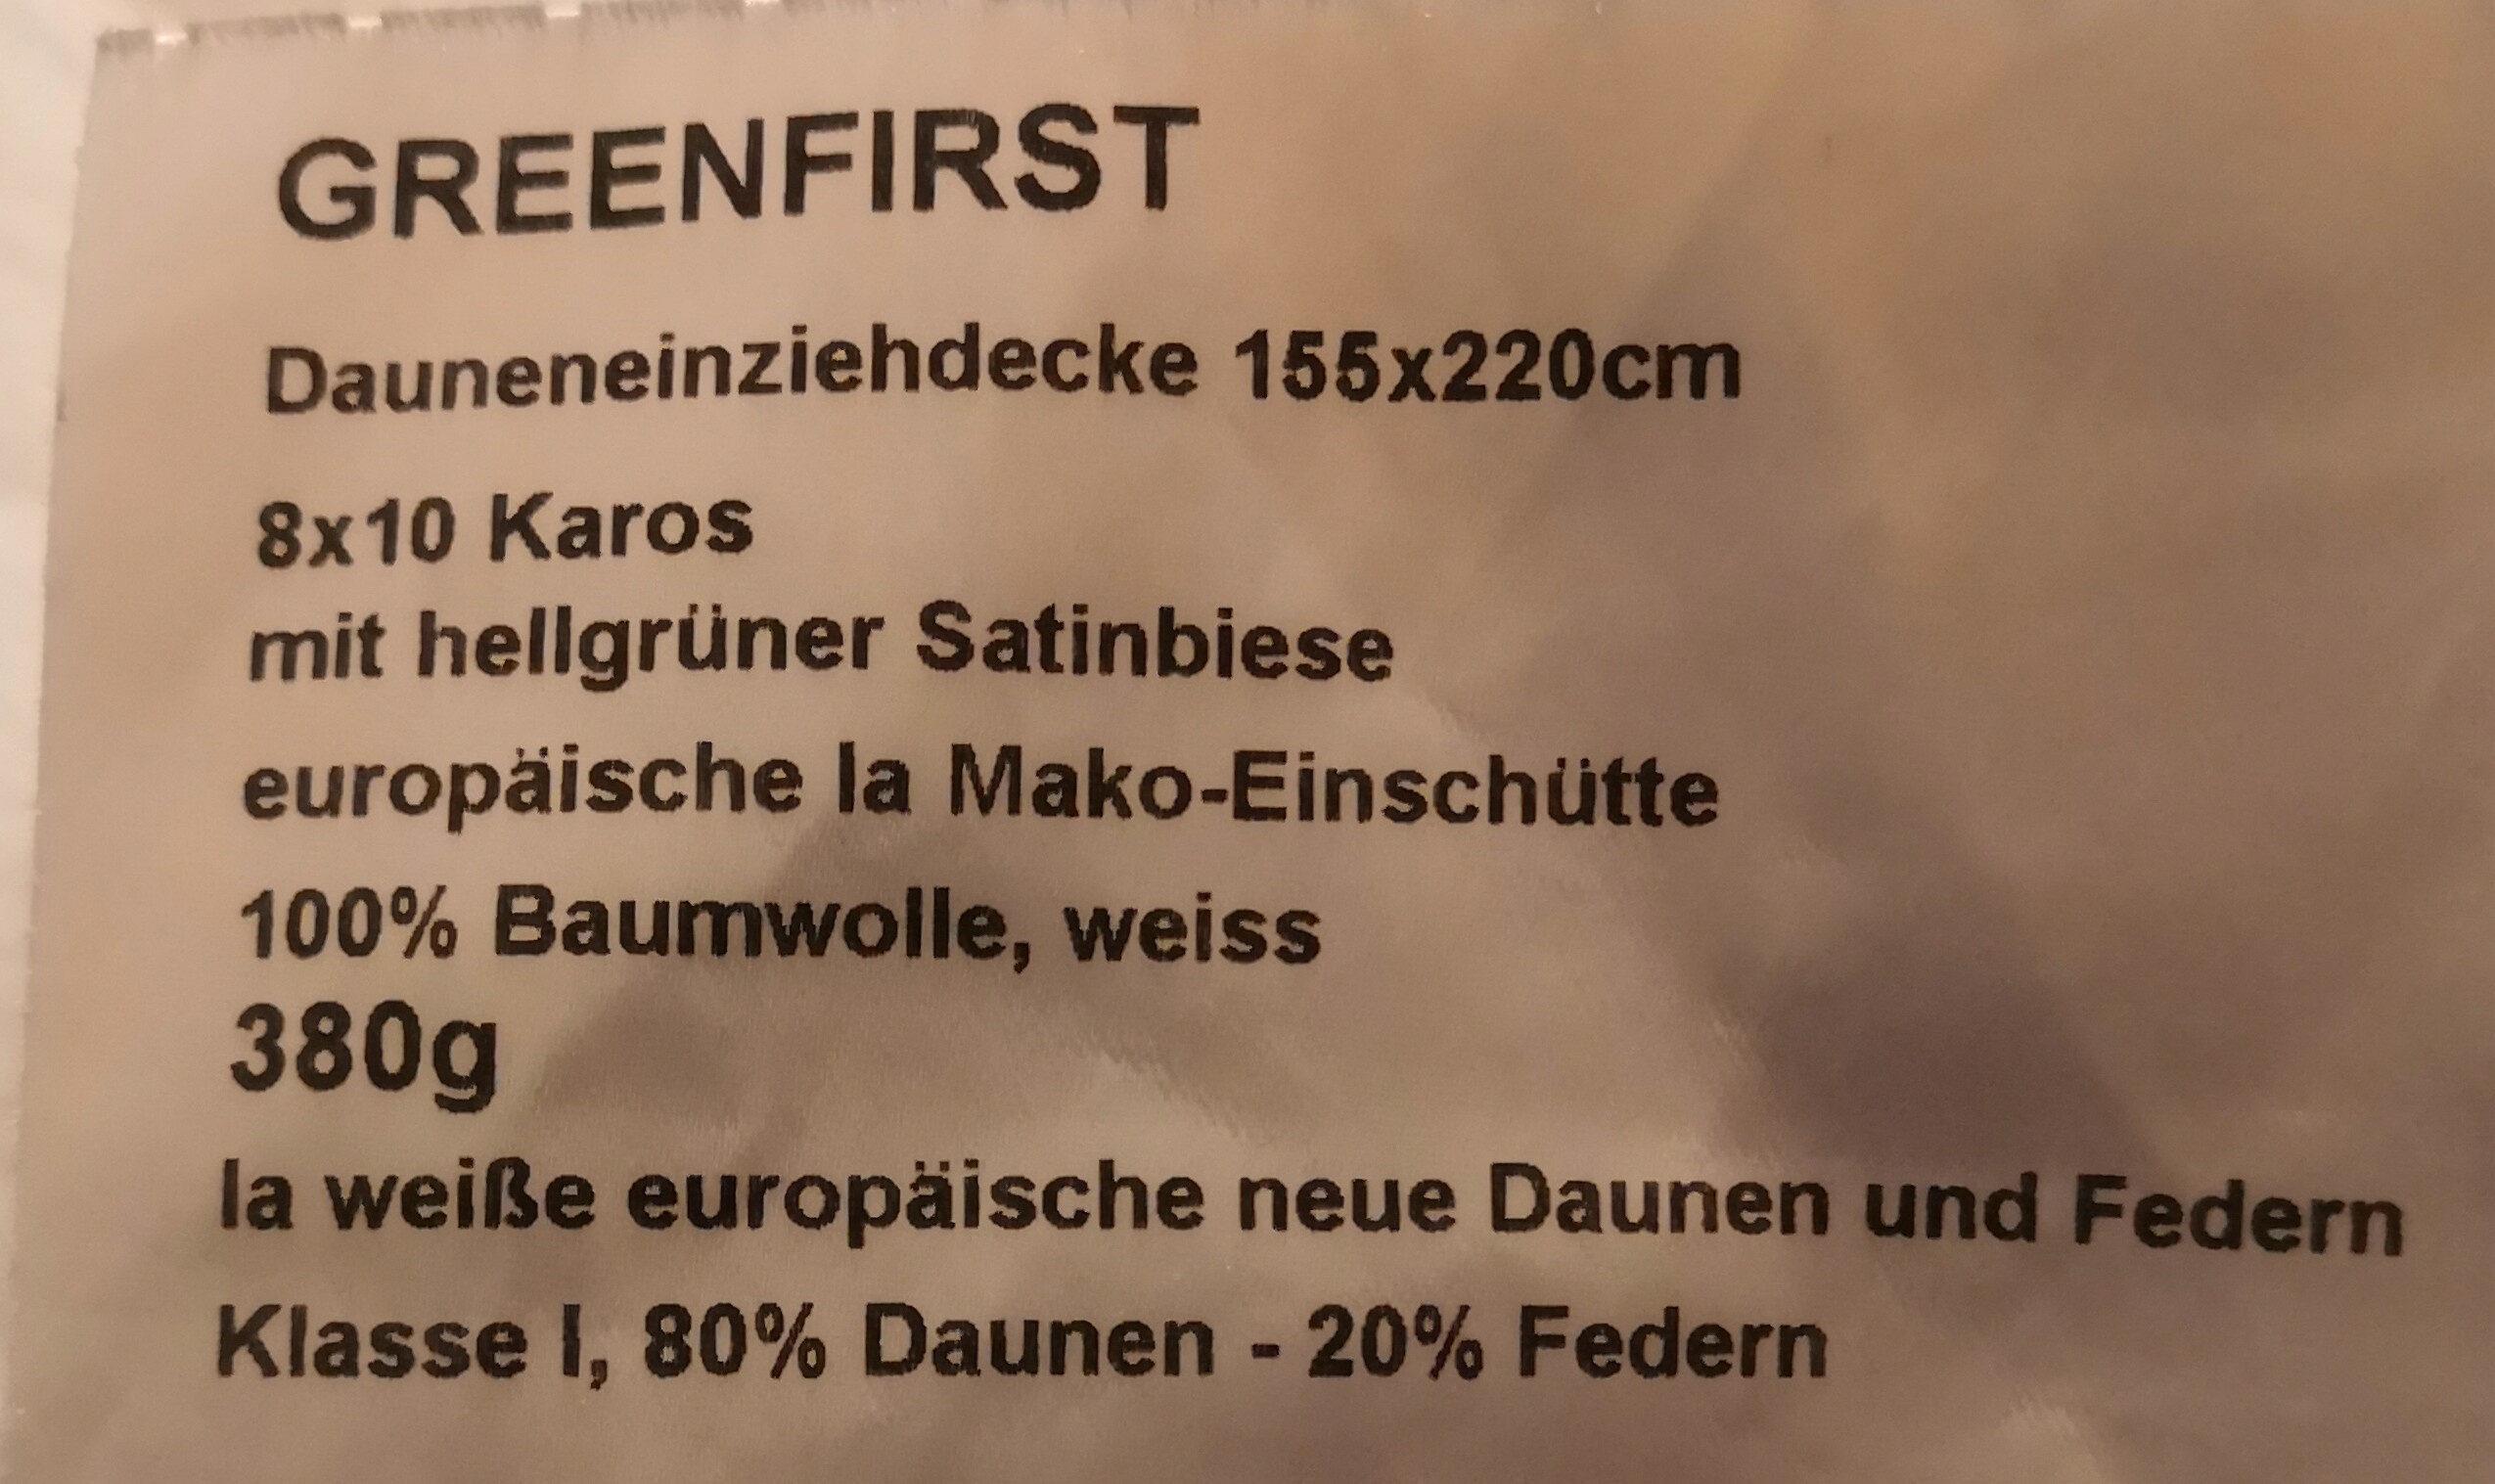 Greenfirst Dauneneinziehdecke 155x220cm - Ingredients - de